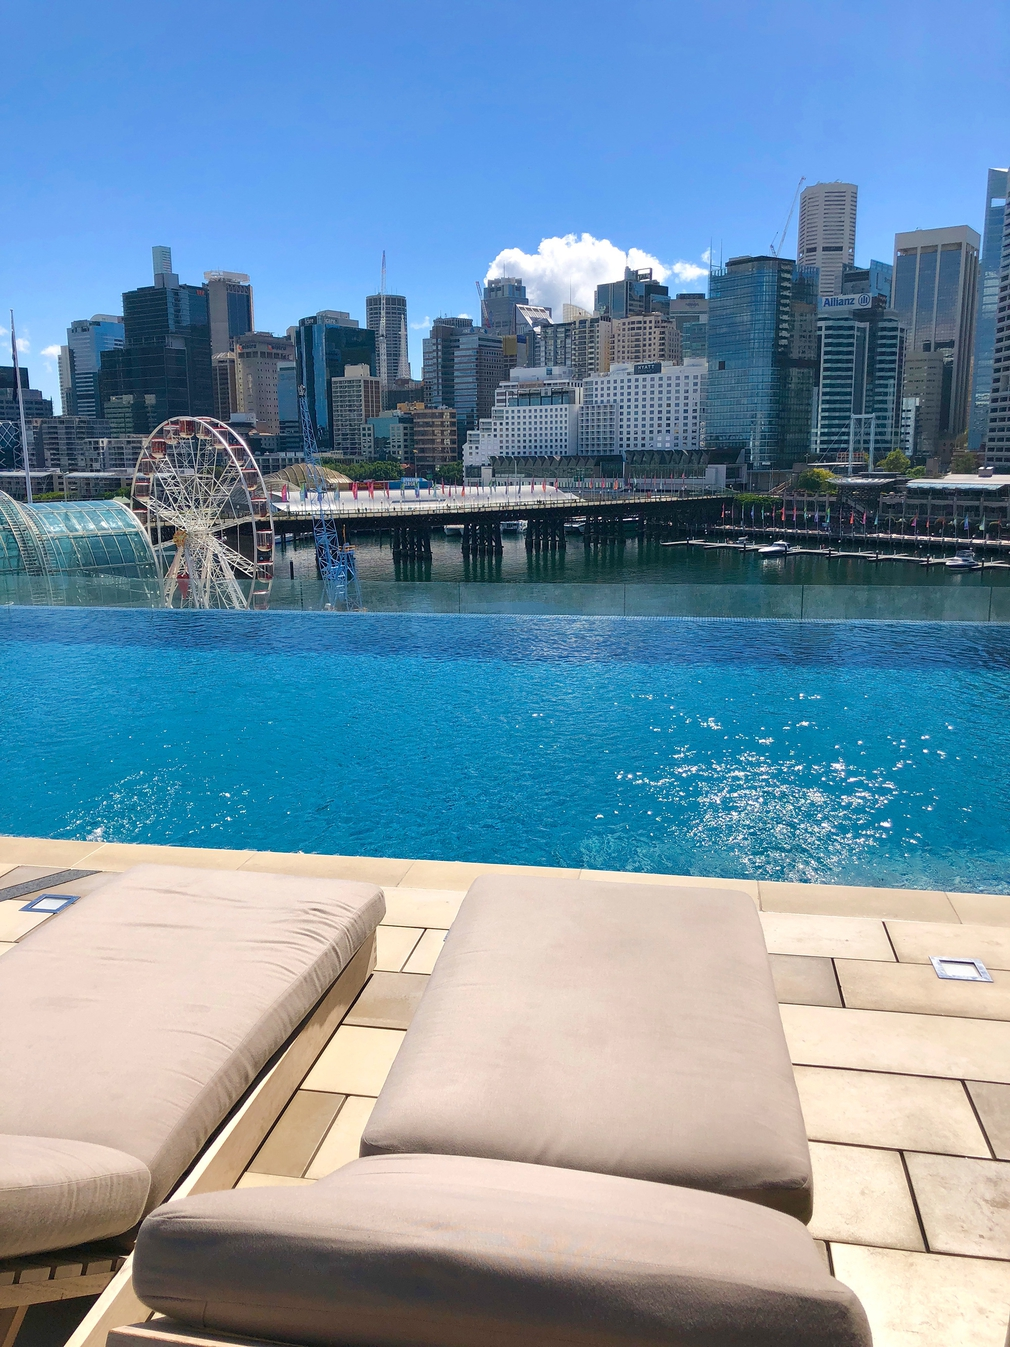 Sofitel-Darling-Harbour-Pool-View-Portrait.jpg